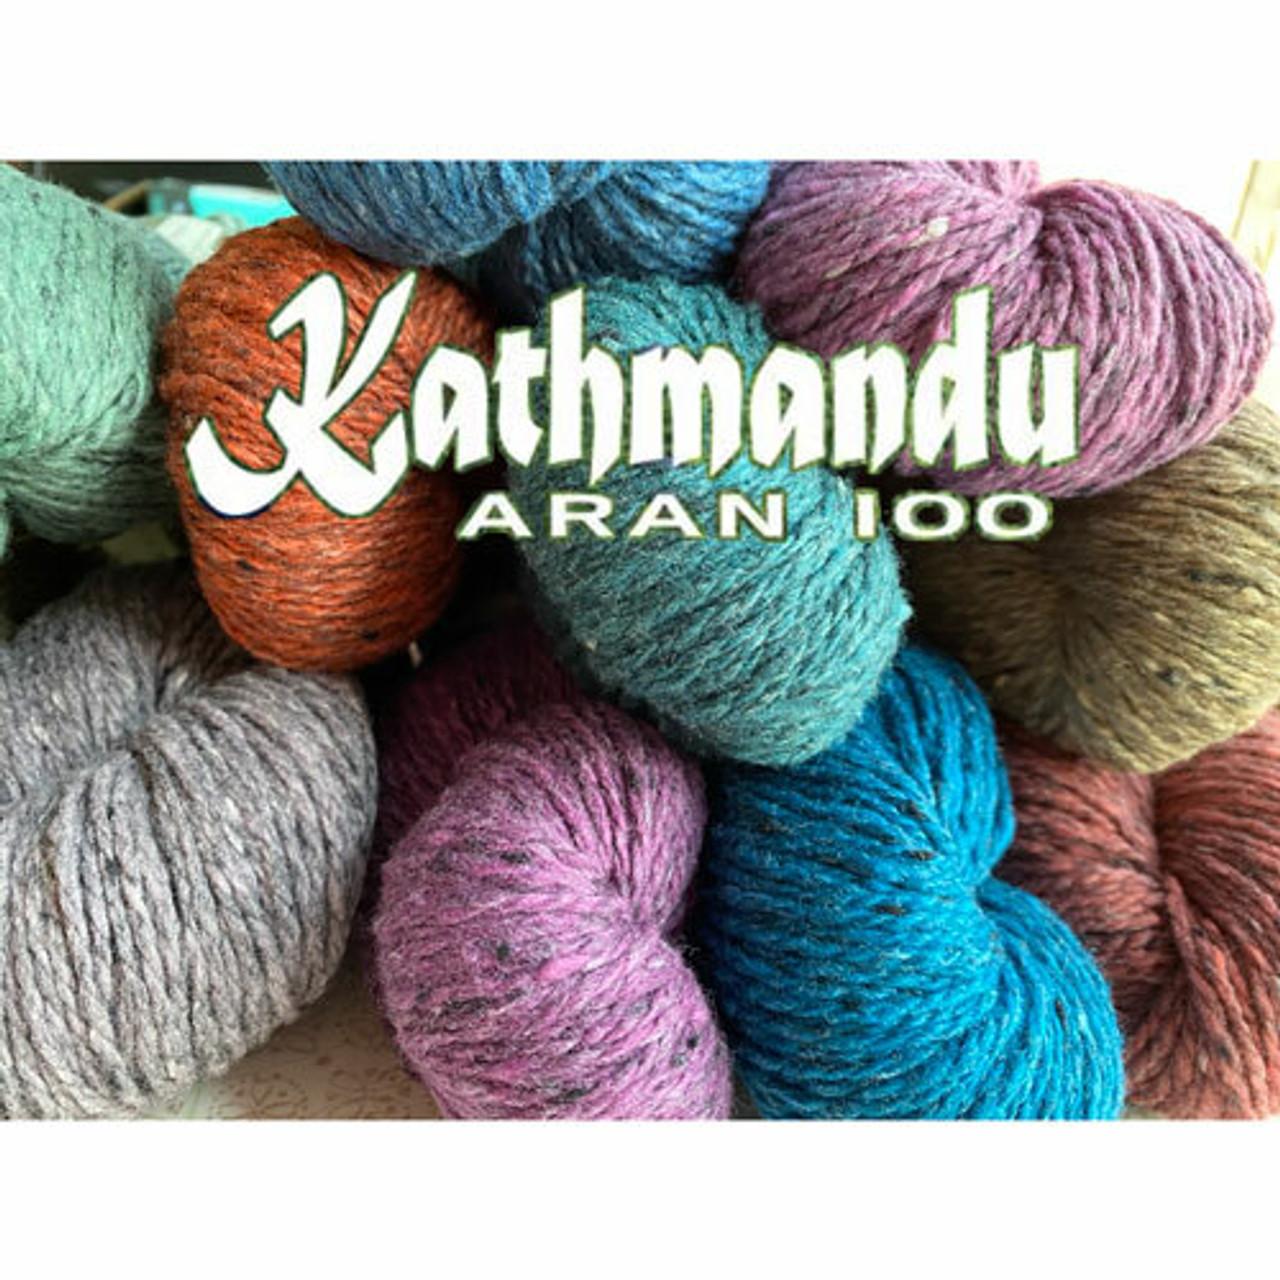 Queensland Collection Kathmandu Aran 100 Yarn